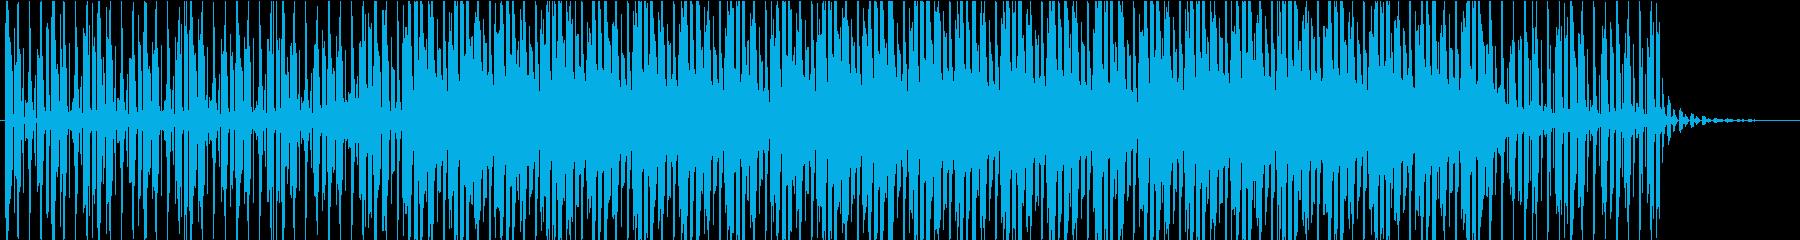 TV・ラジオに使われそうなBGMの再生済みの波形